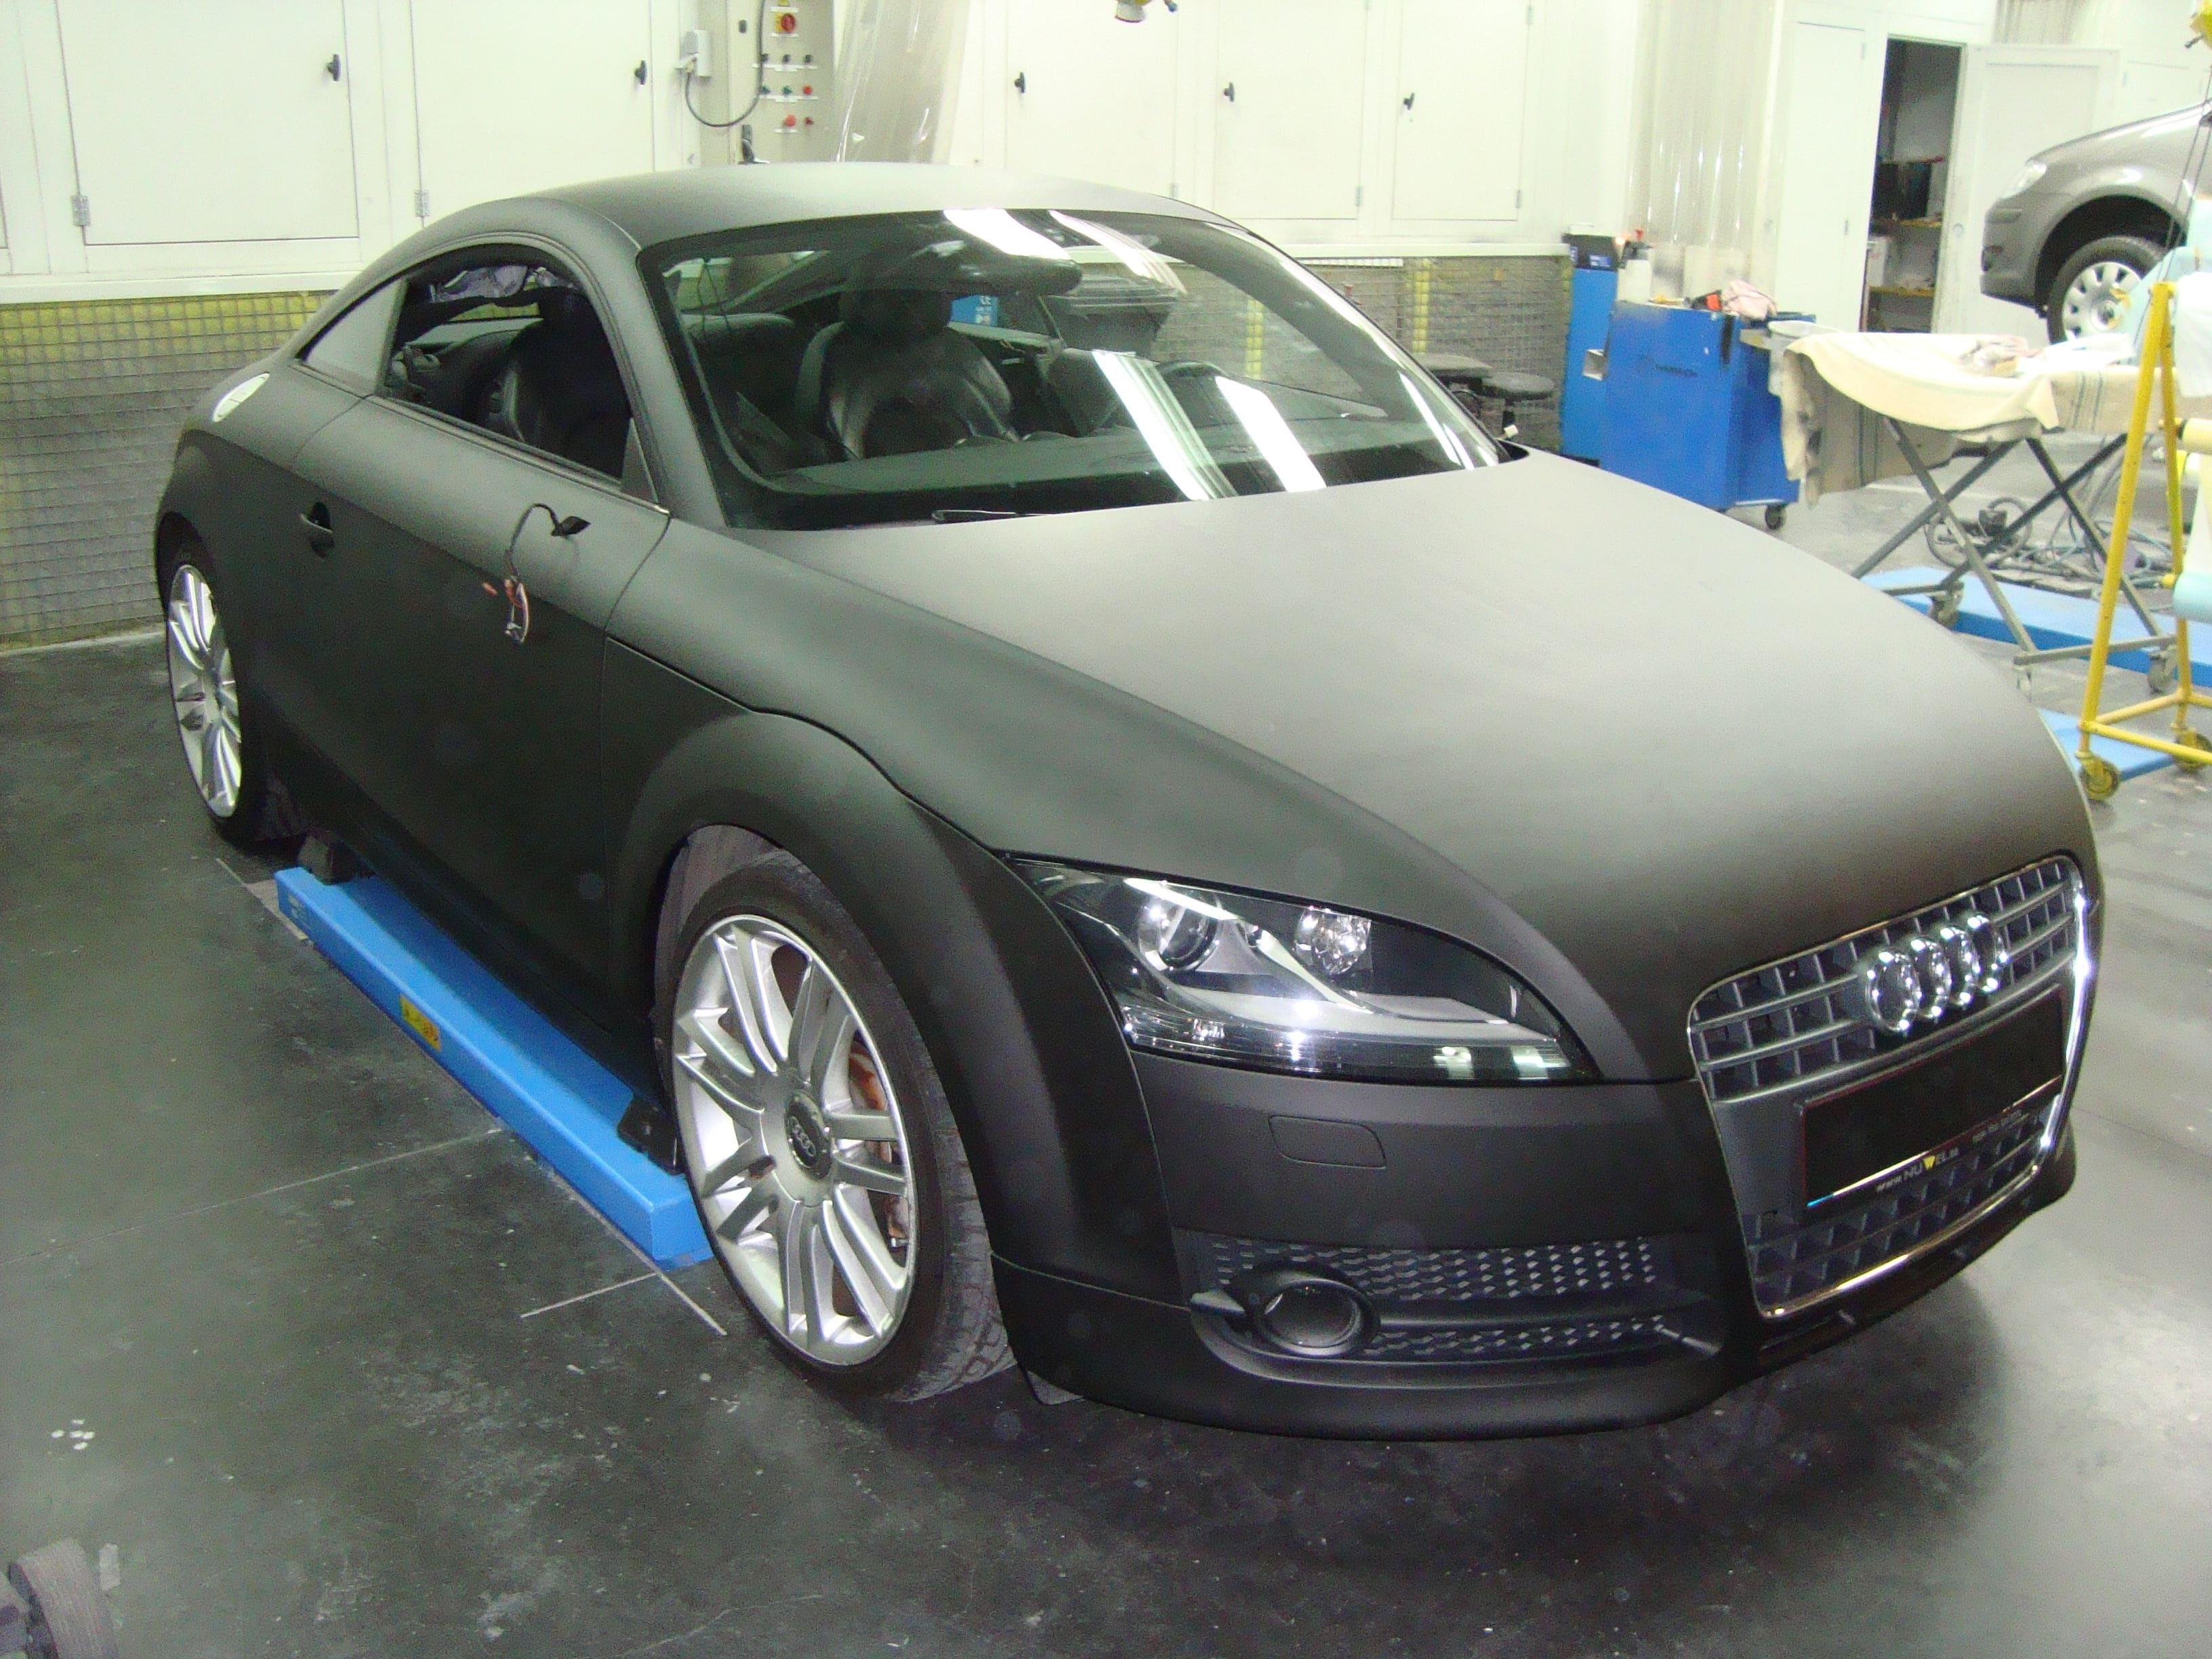 Audi TT met Mat Zwarte Wrap, Carwrapping door Wrapmyride.nu Foto-nr:5109, ©2021